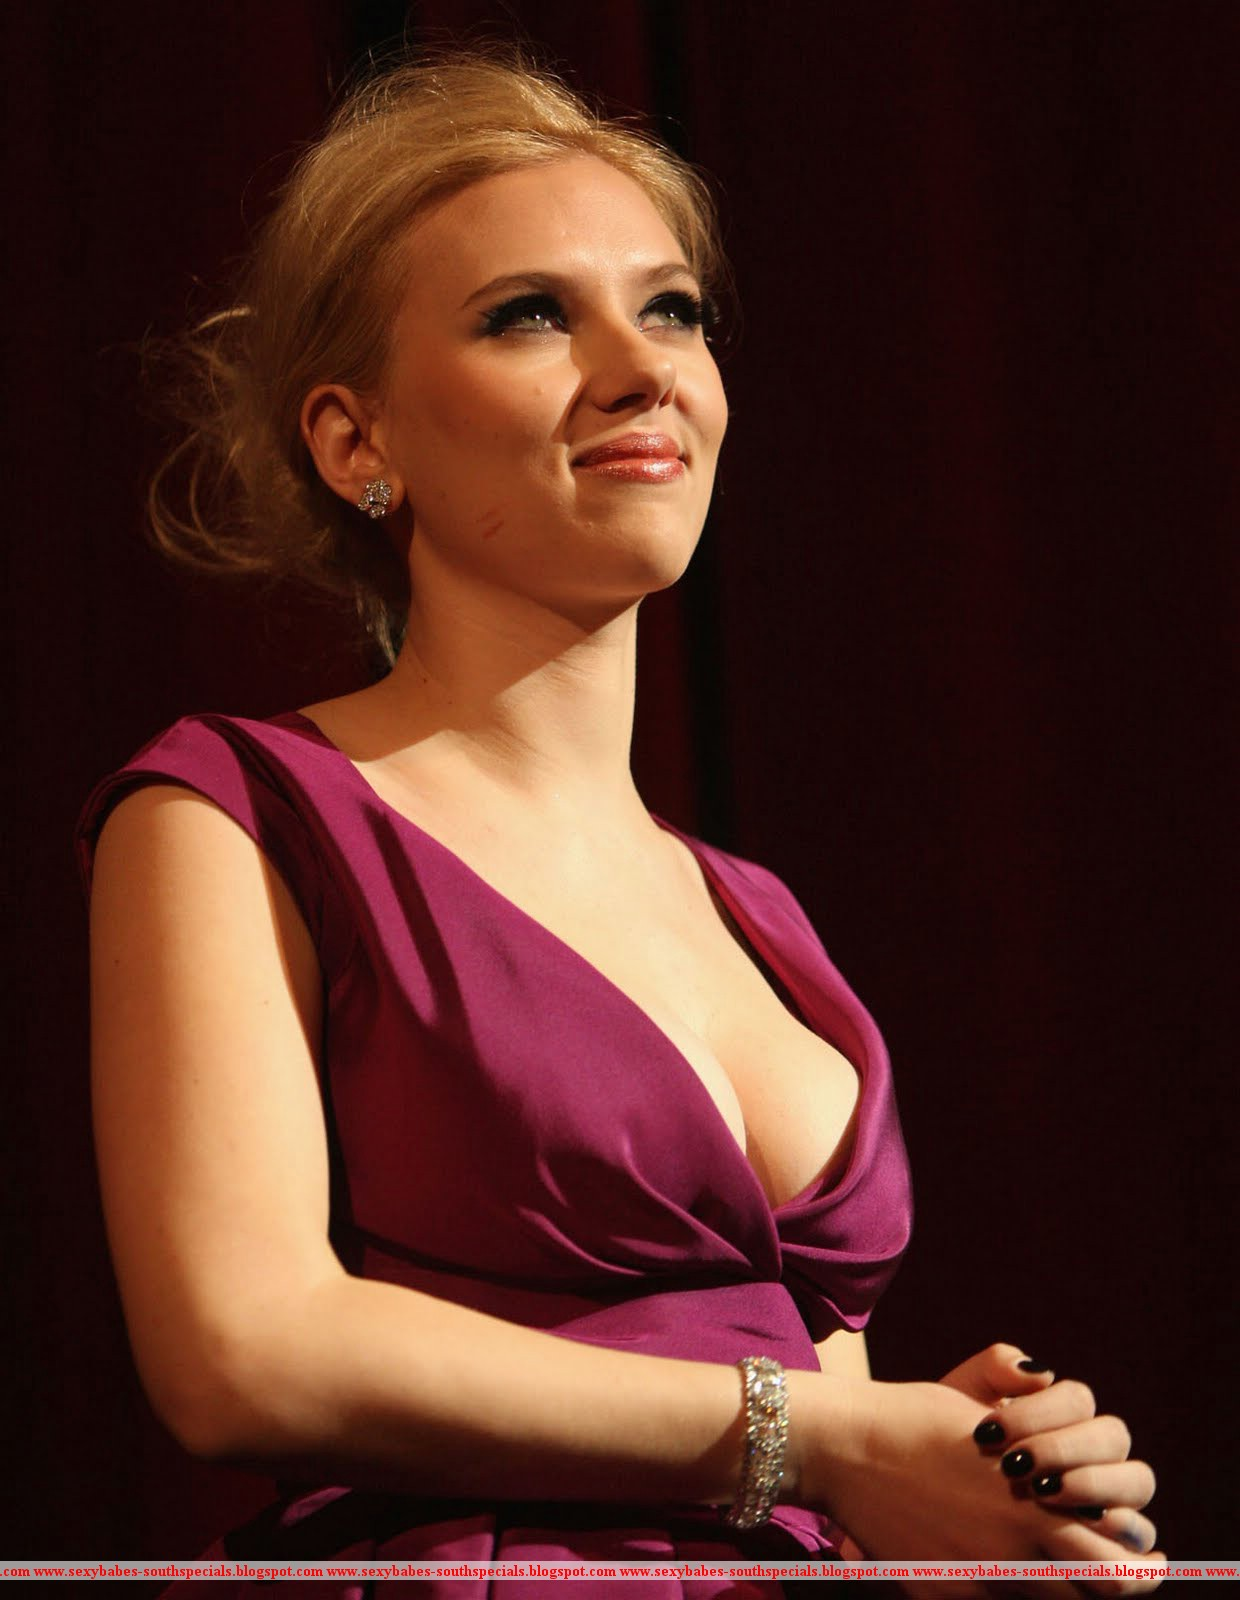 big cleavage johansson Scarlett